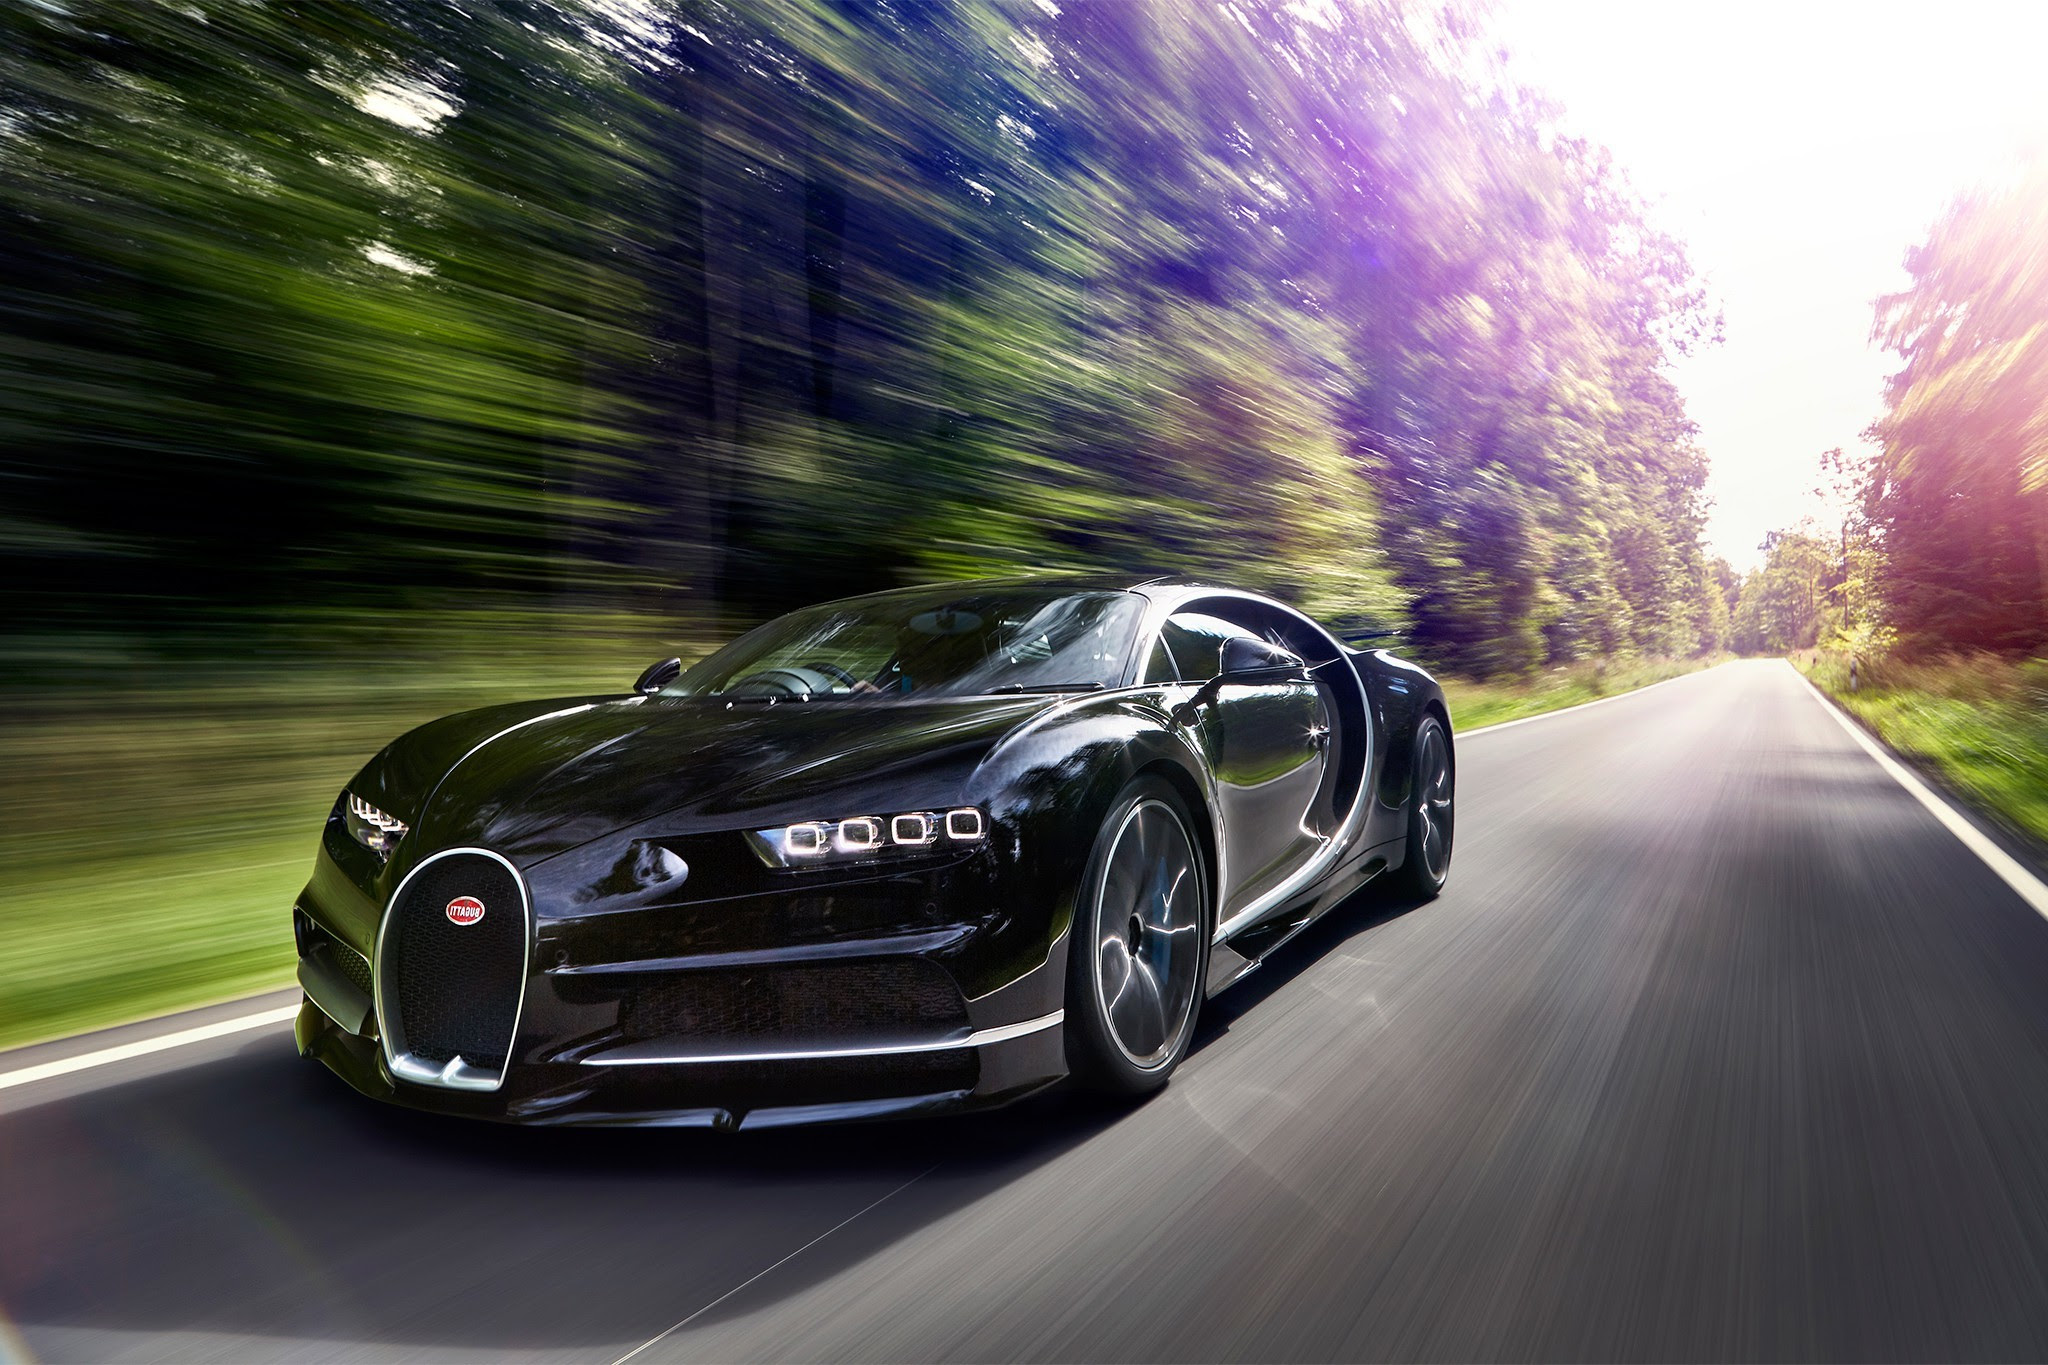 Bugatti Chiron Wallpapers (74+ images)